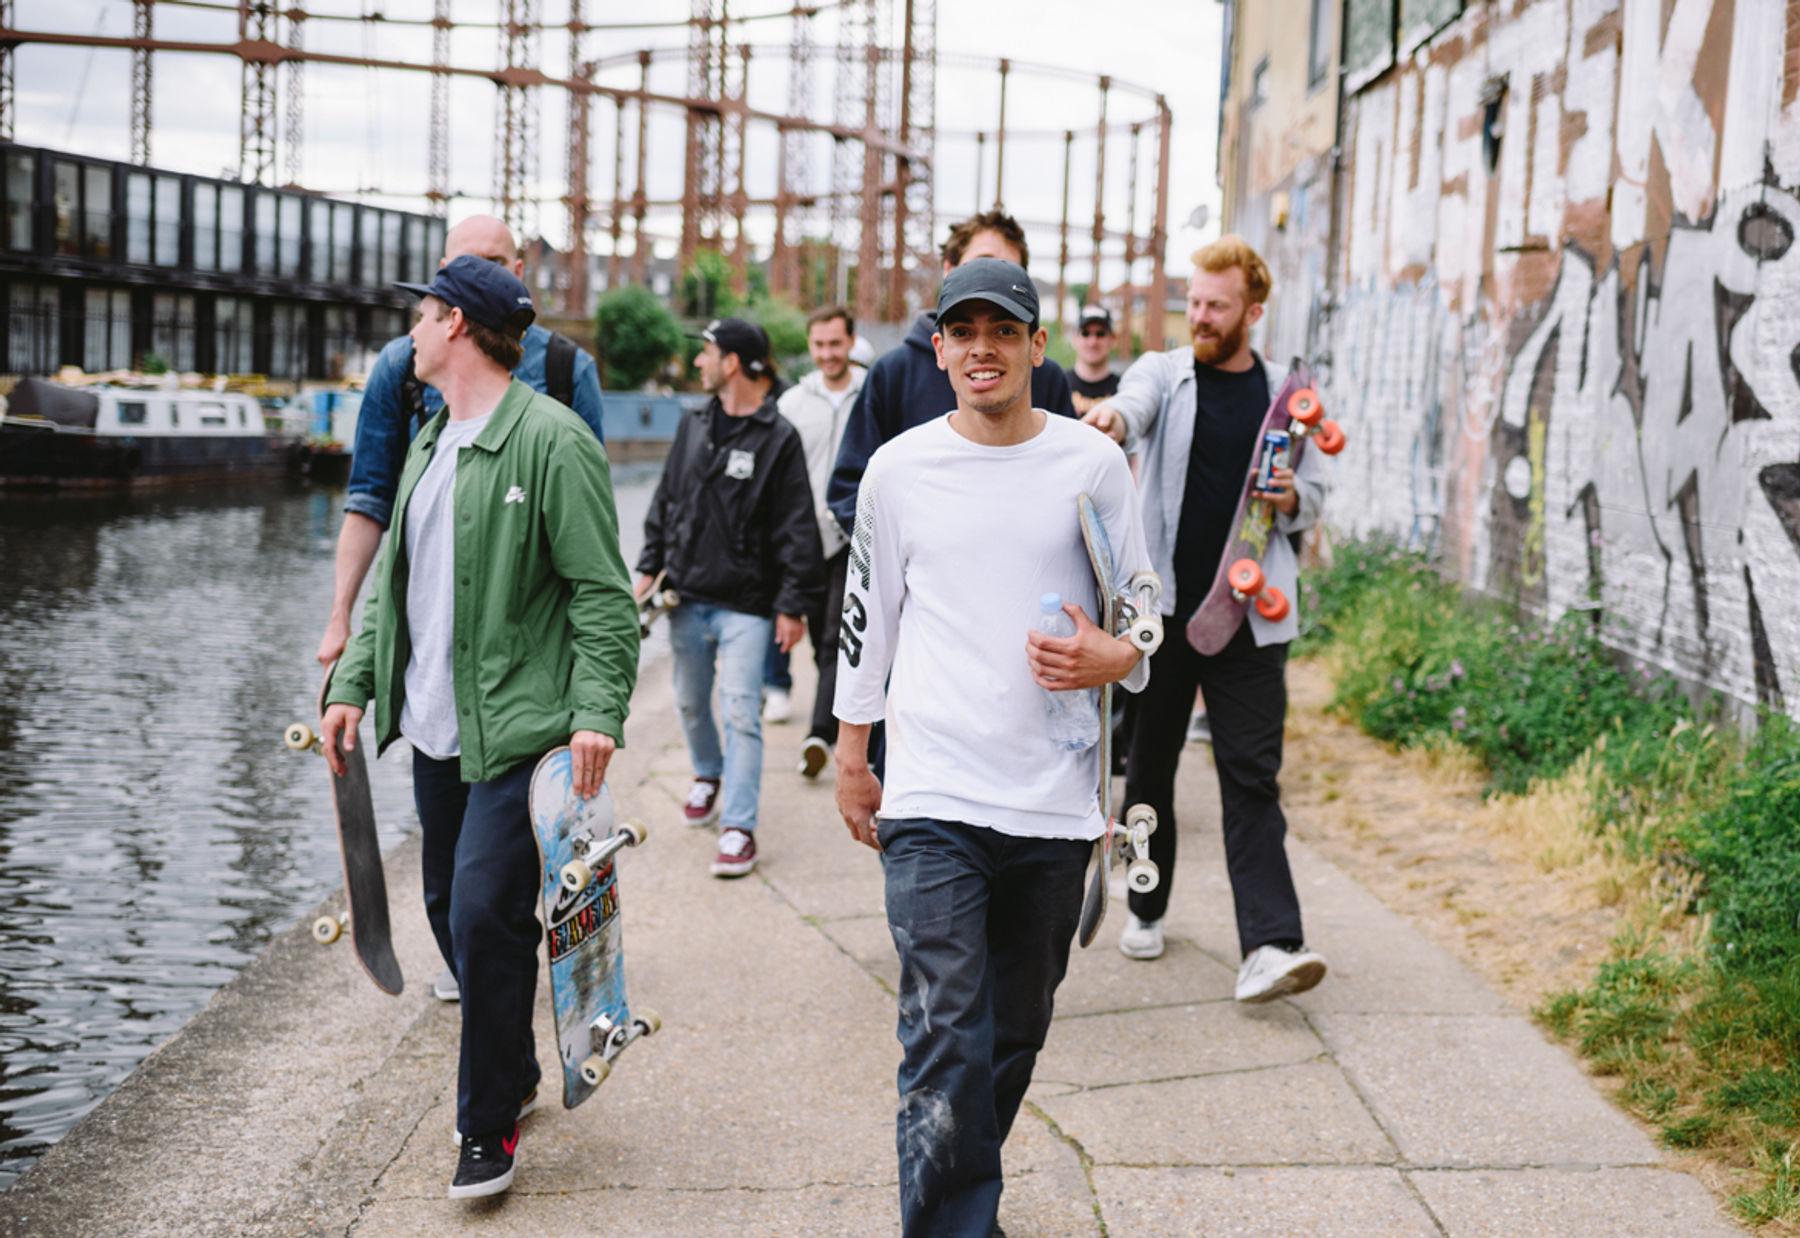 _IHC7929e-Mark-Jackson-Matthew-Hay-Kyron-Davis-Magnus-Kreiberg-Rob-Mathieson-Nike-SB-x-Slam-City-Skates-Go-Skateboarding-Day-London-June-2015-Photographer-Maksim-Kalanep